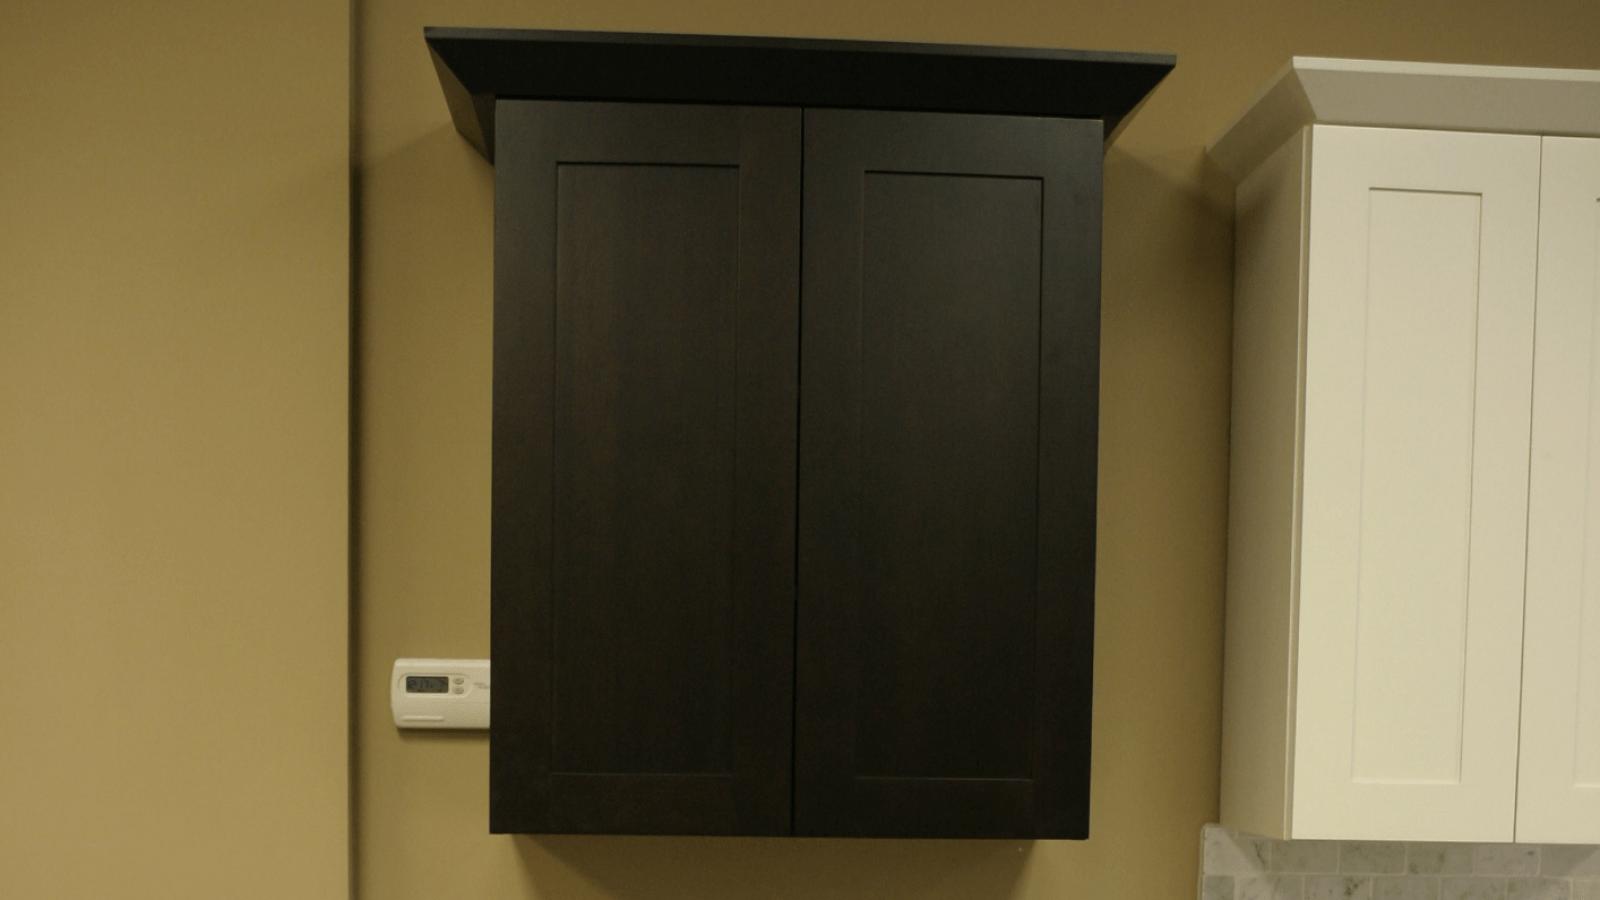 Buckhead Kitchen Frugal Kitchens Amp Cabinets